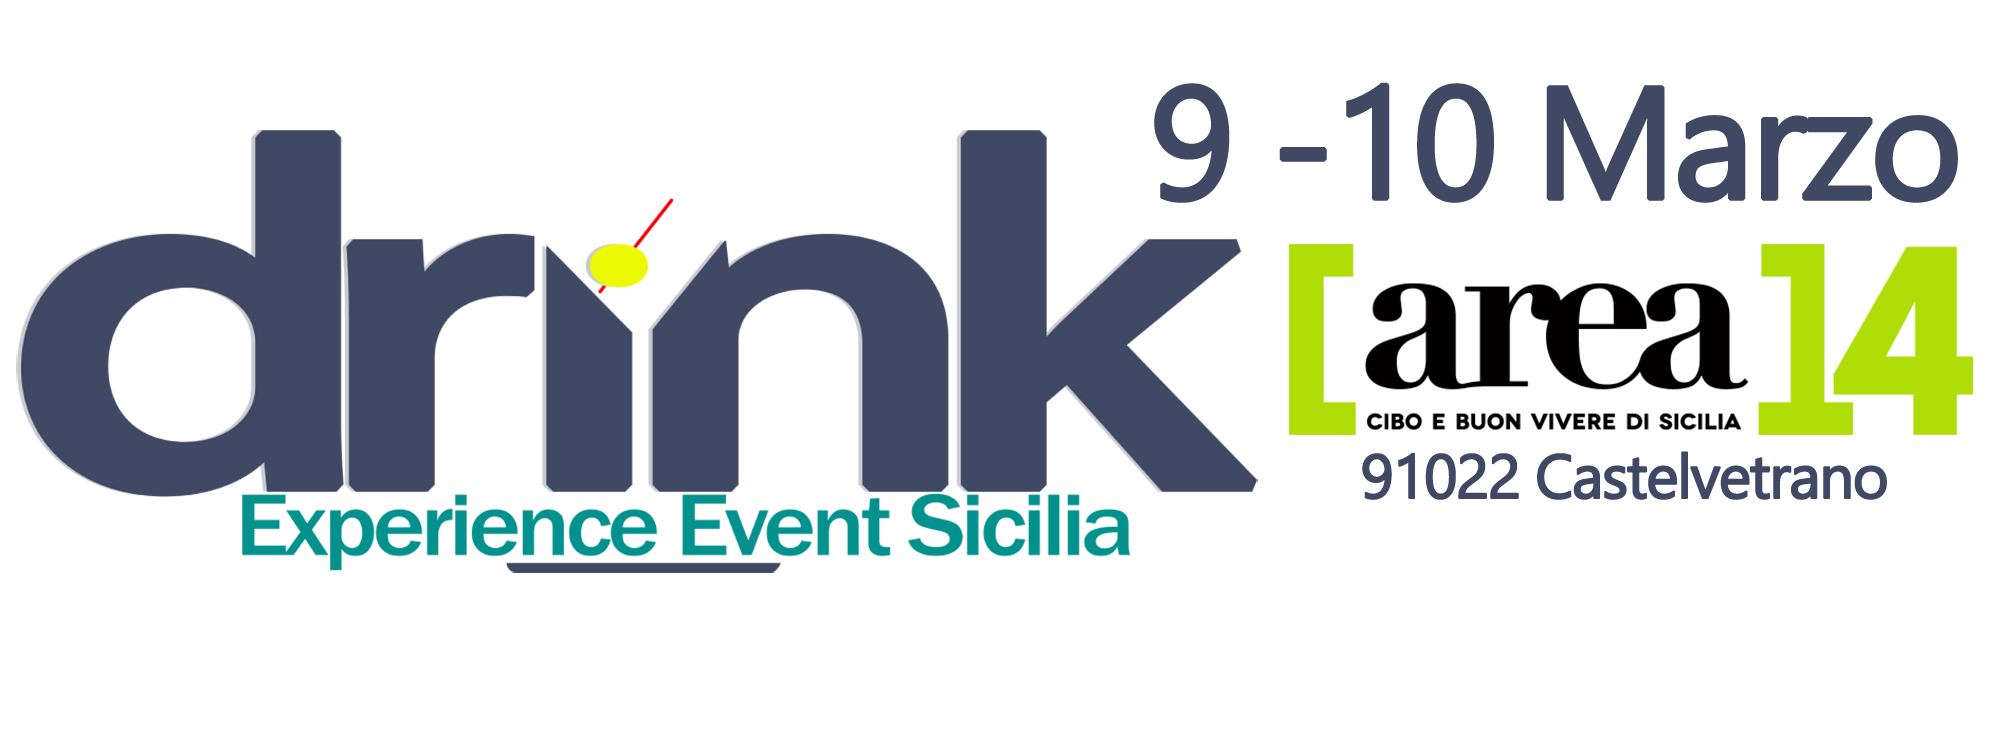 Drink – Experience Event Sicilia